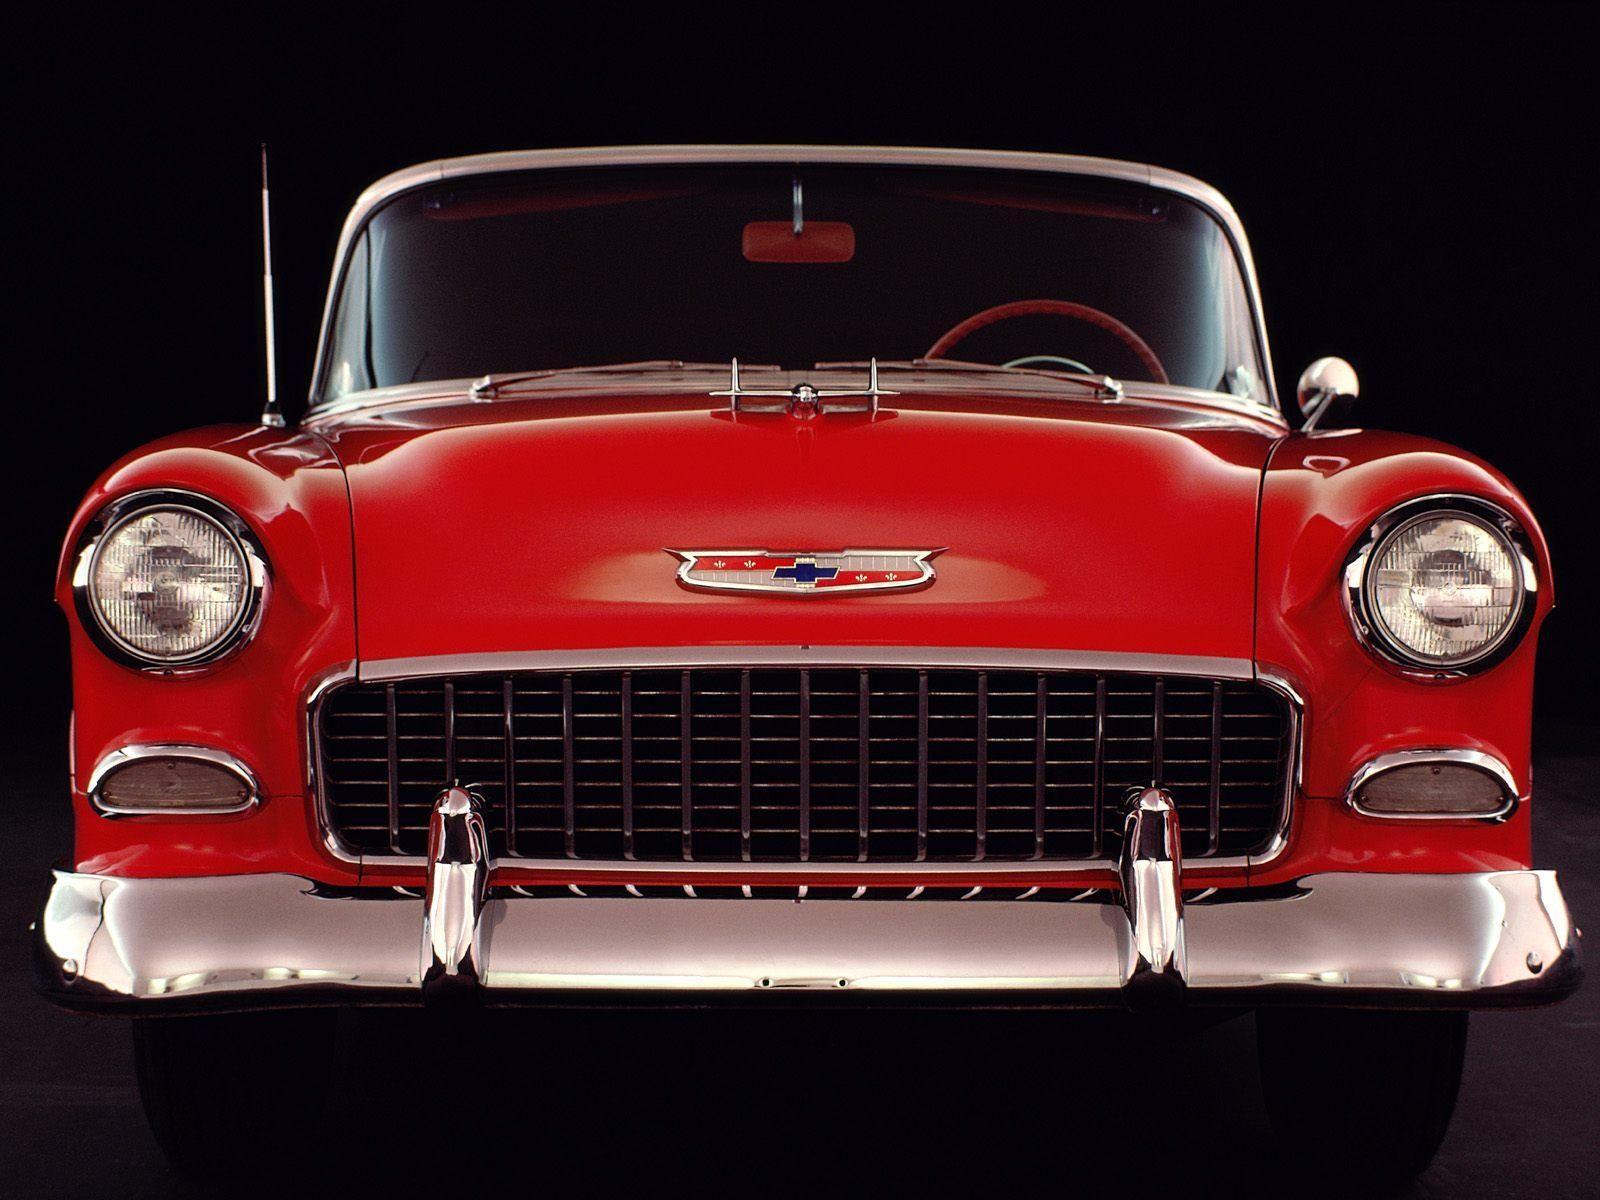 Vintage Car An American Classic Car Chevrolet Free Desktop